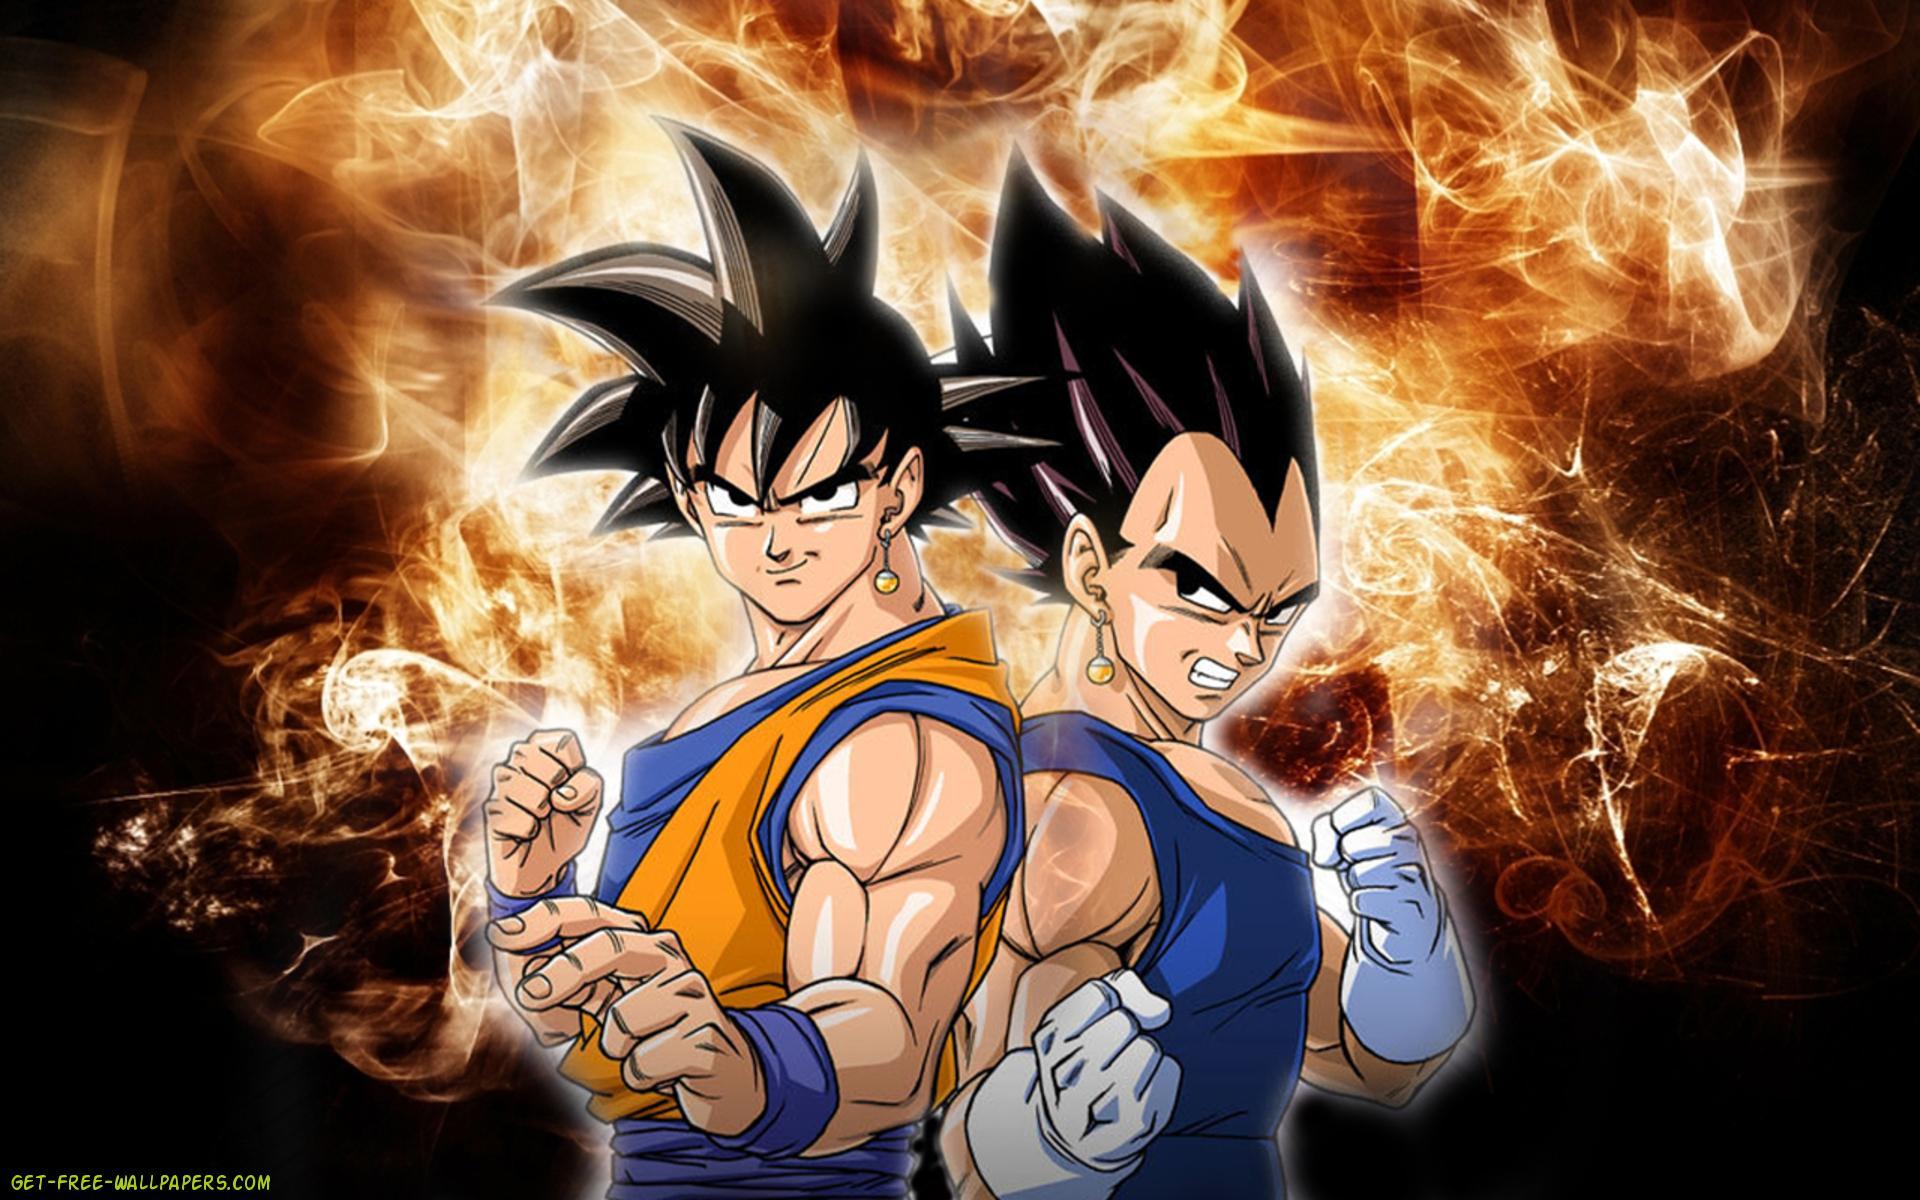 Goku vs vegeta wallpaper wallpapersafari - Goku kamehameha live wallpaper ...